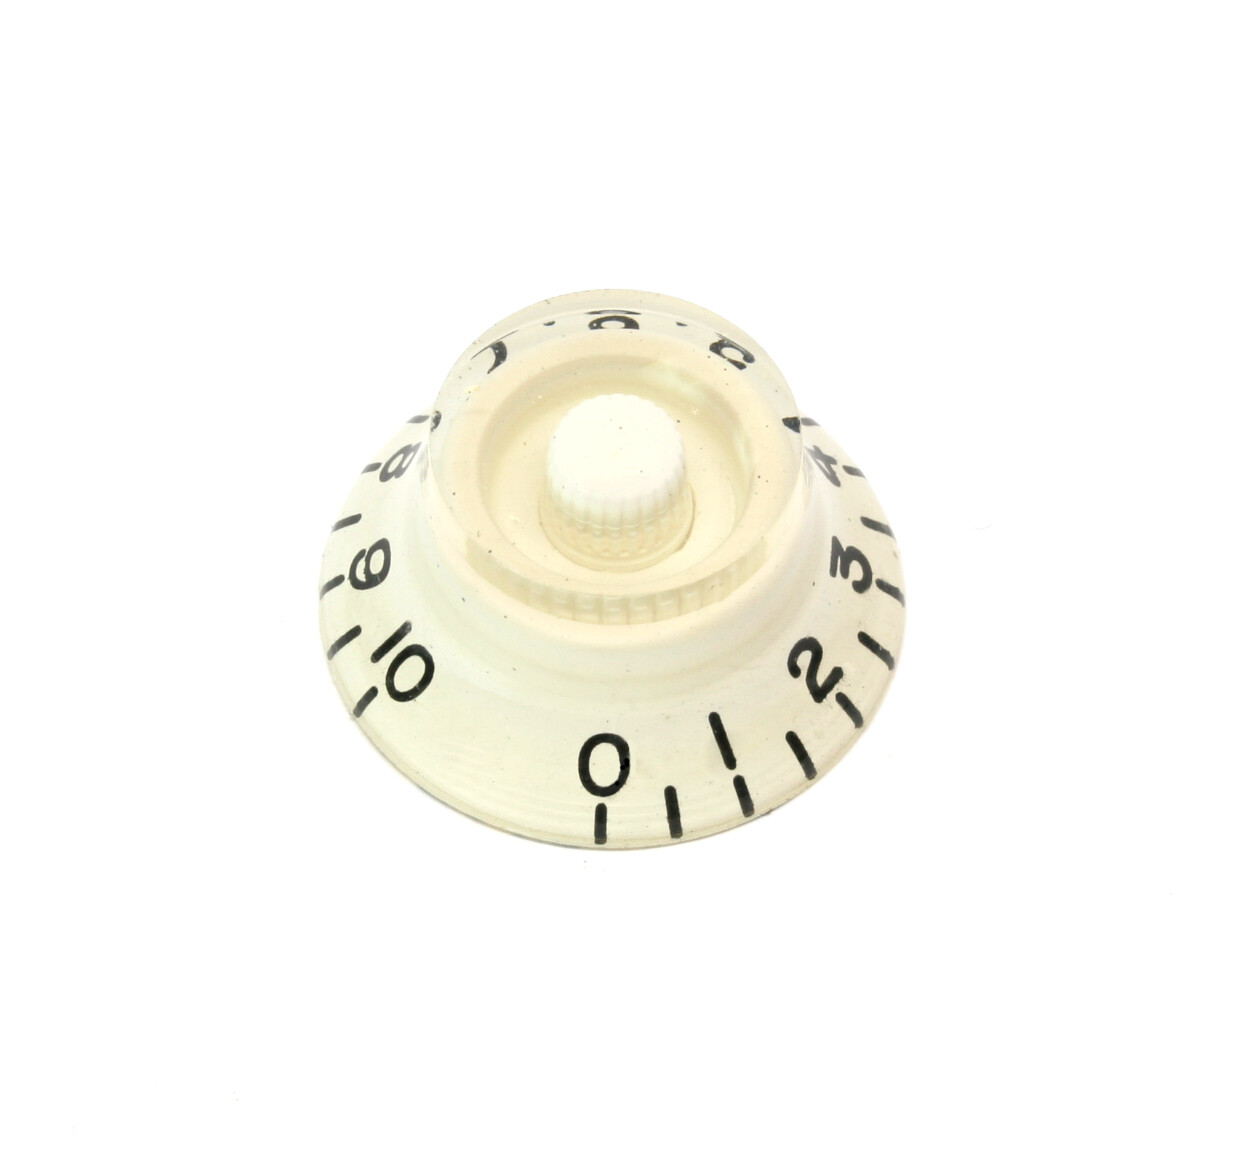 White Bell knob, vintage style numbers, fits USA split shaft pots.